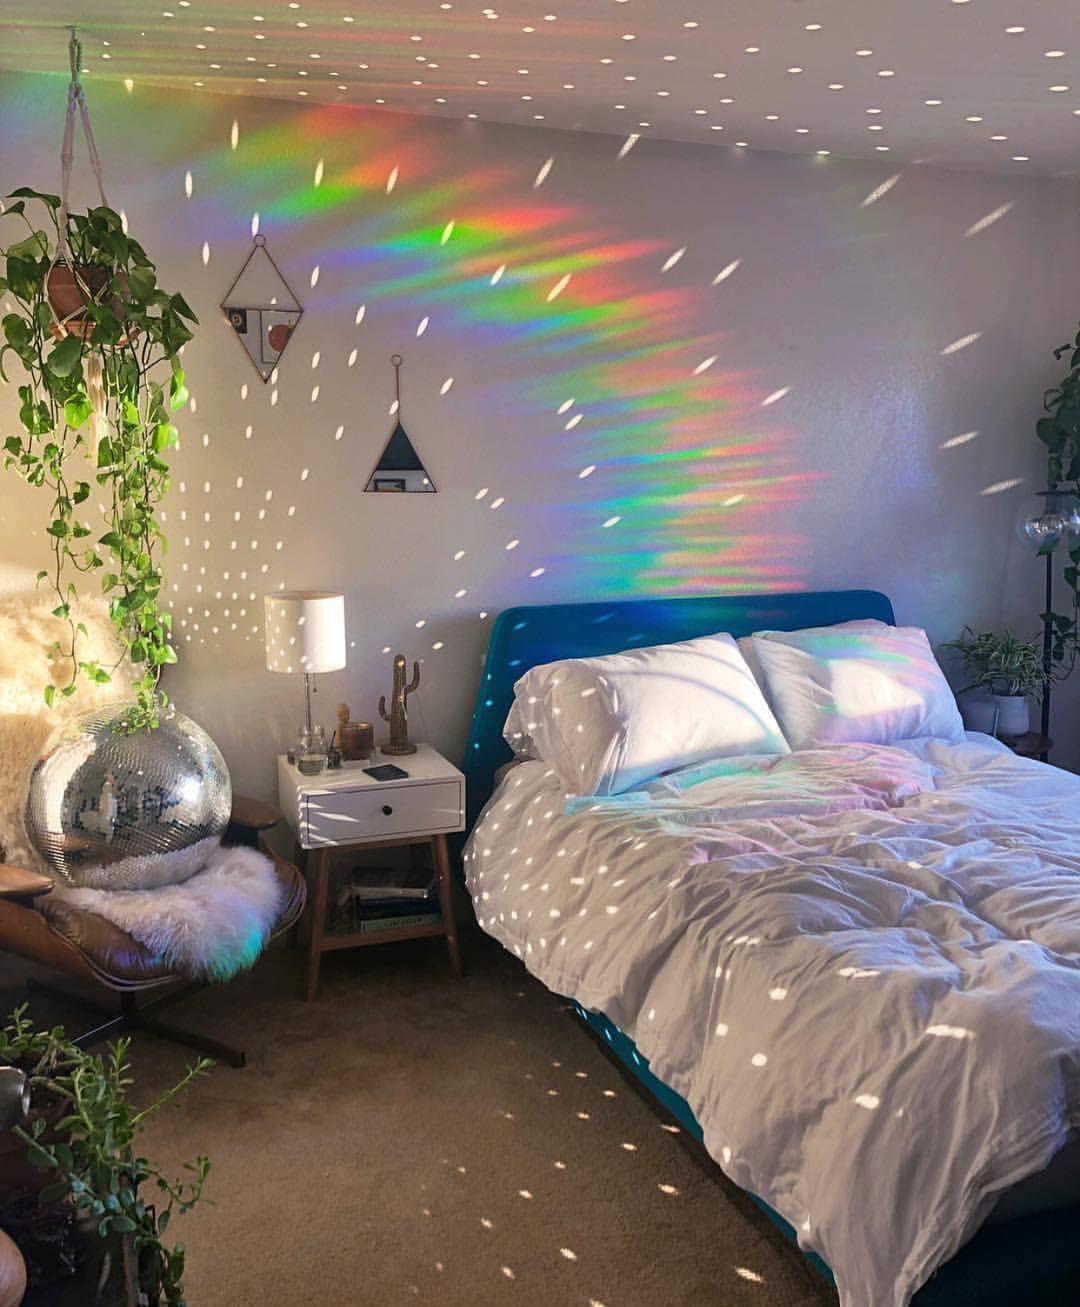 "Photo of Rainbow Symphony on Instagram: ""Disco Rainbow Room Vibes @bobwolfley ✨🌈"""